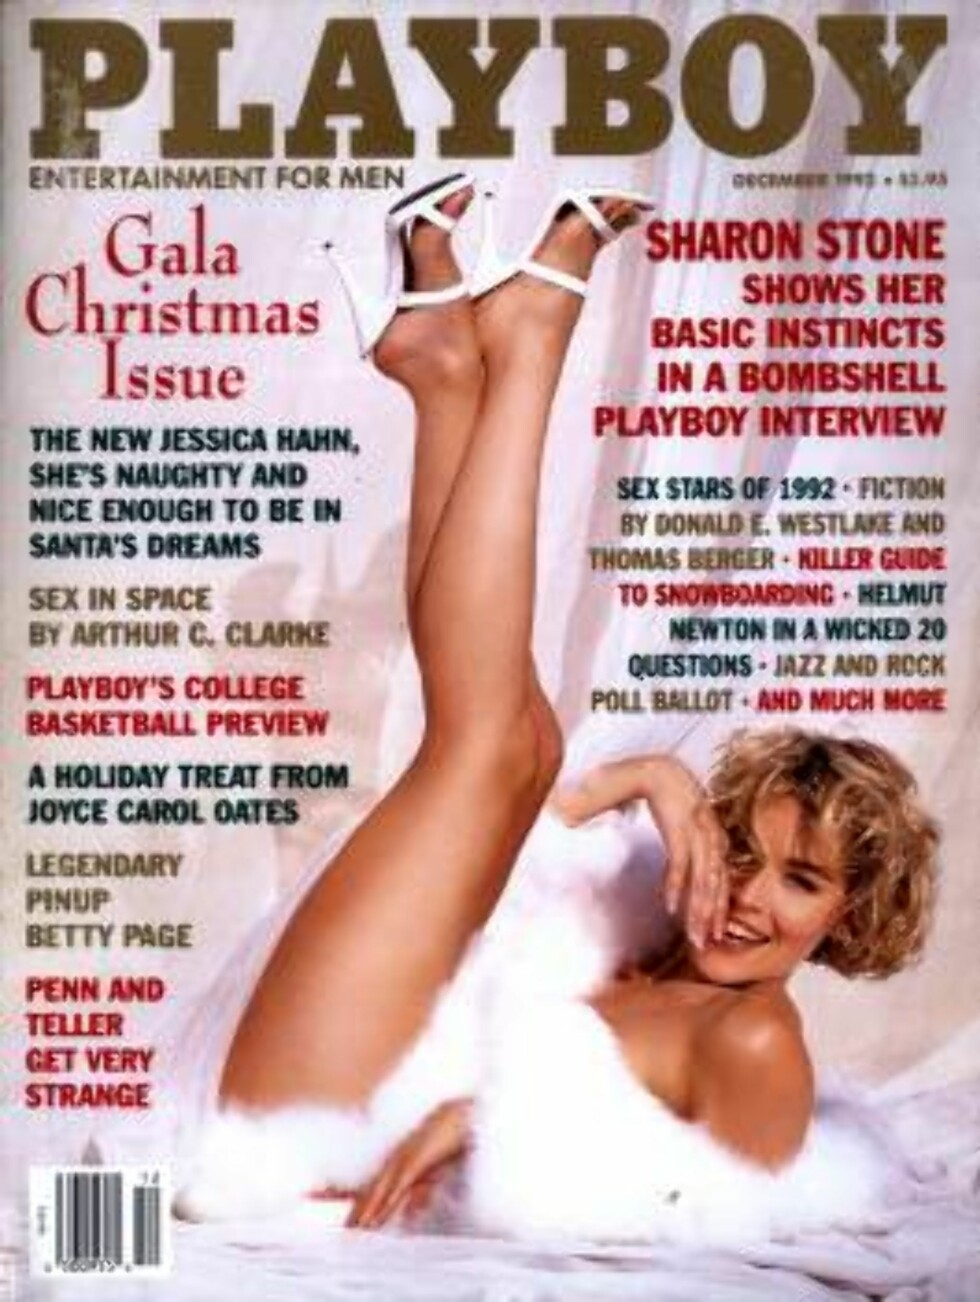 AVKLEDD: Sharon Stone i en frekk Playboy-positur. Foto: AP/Scanpix